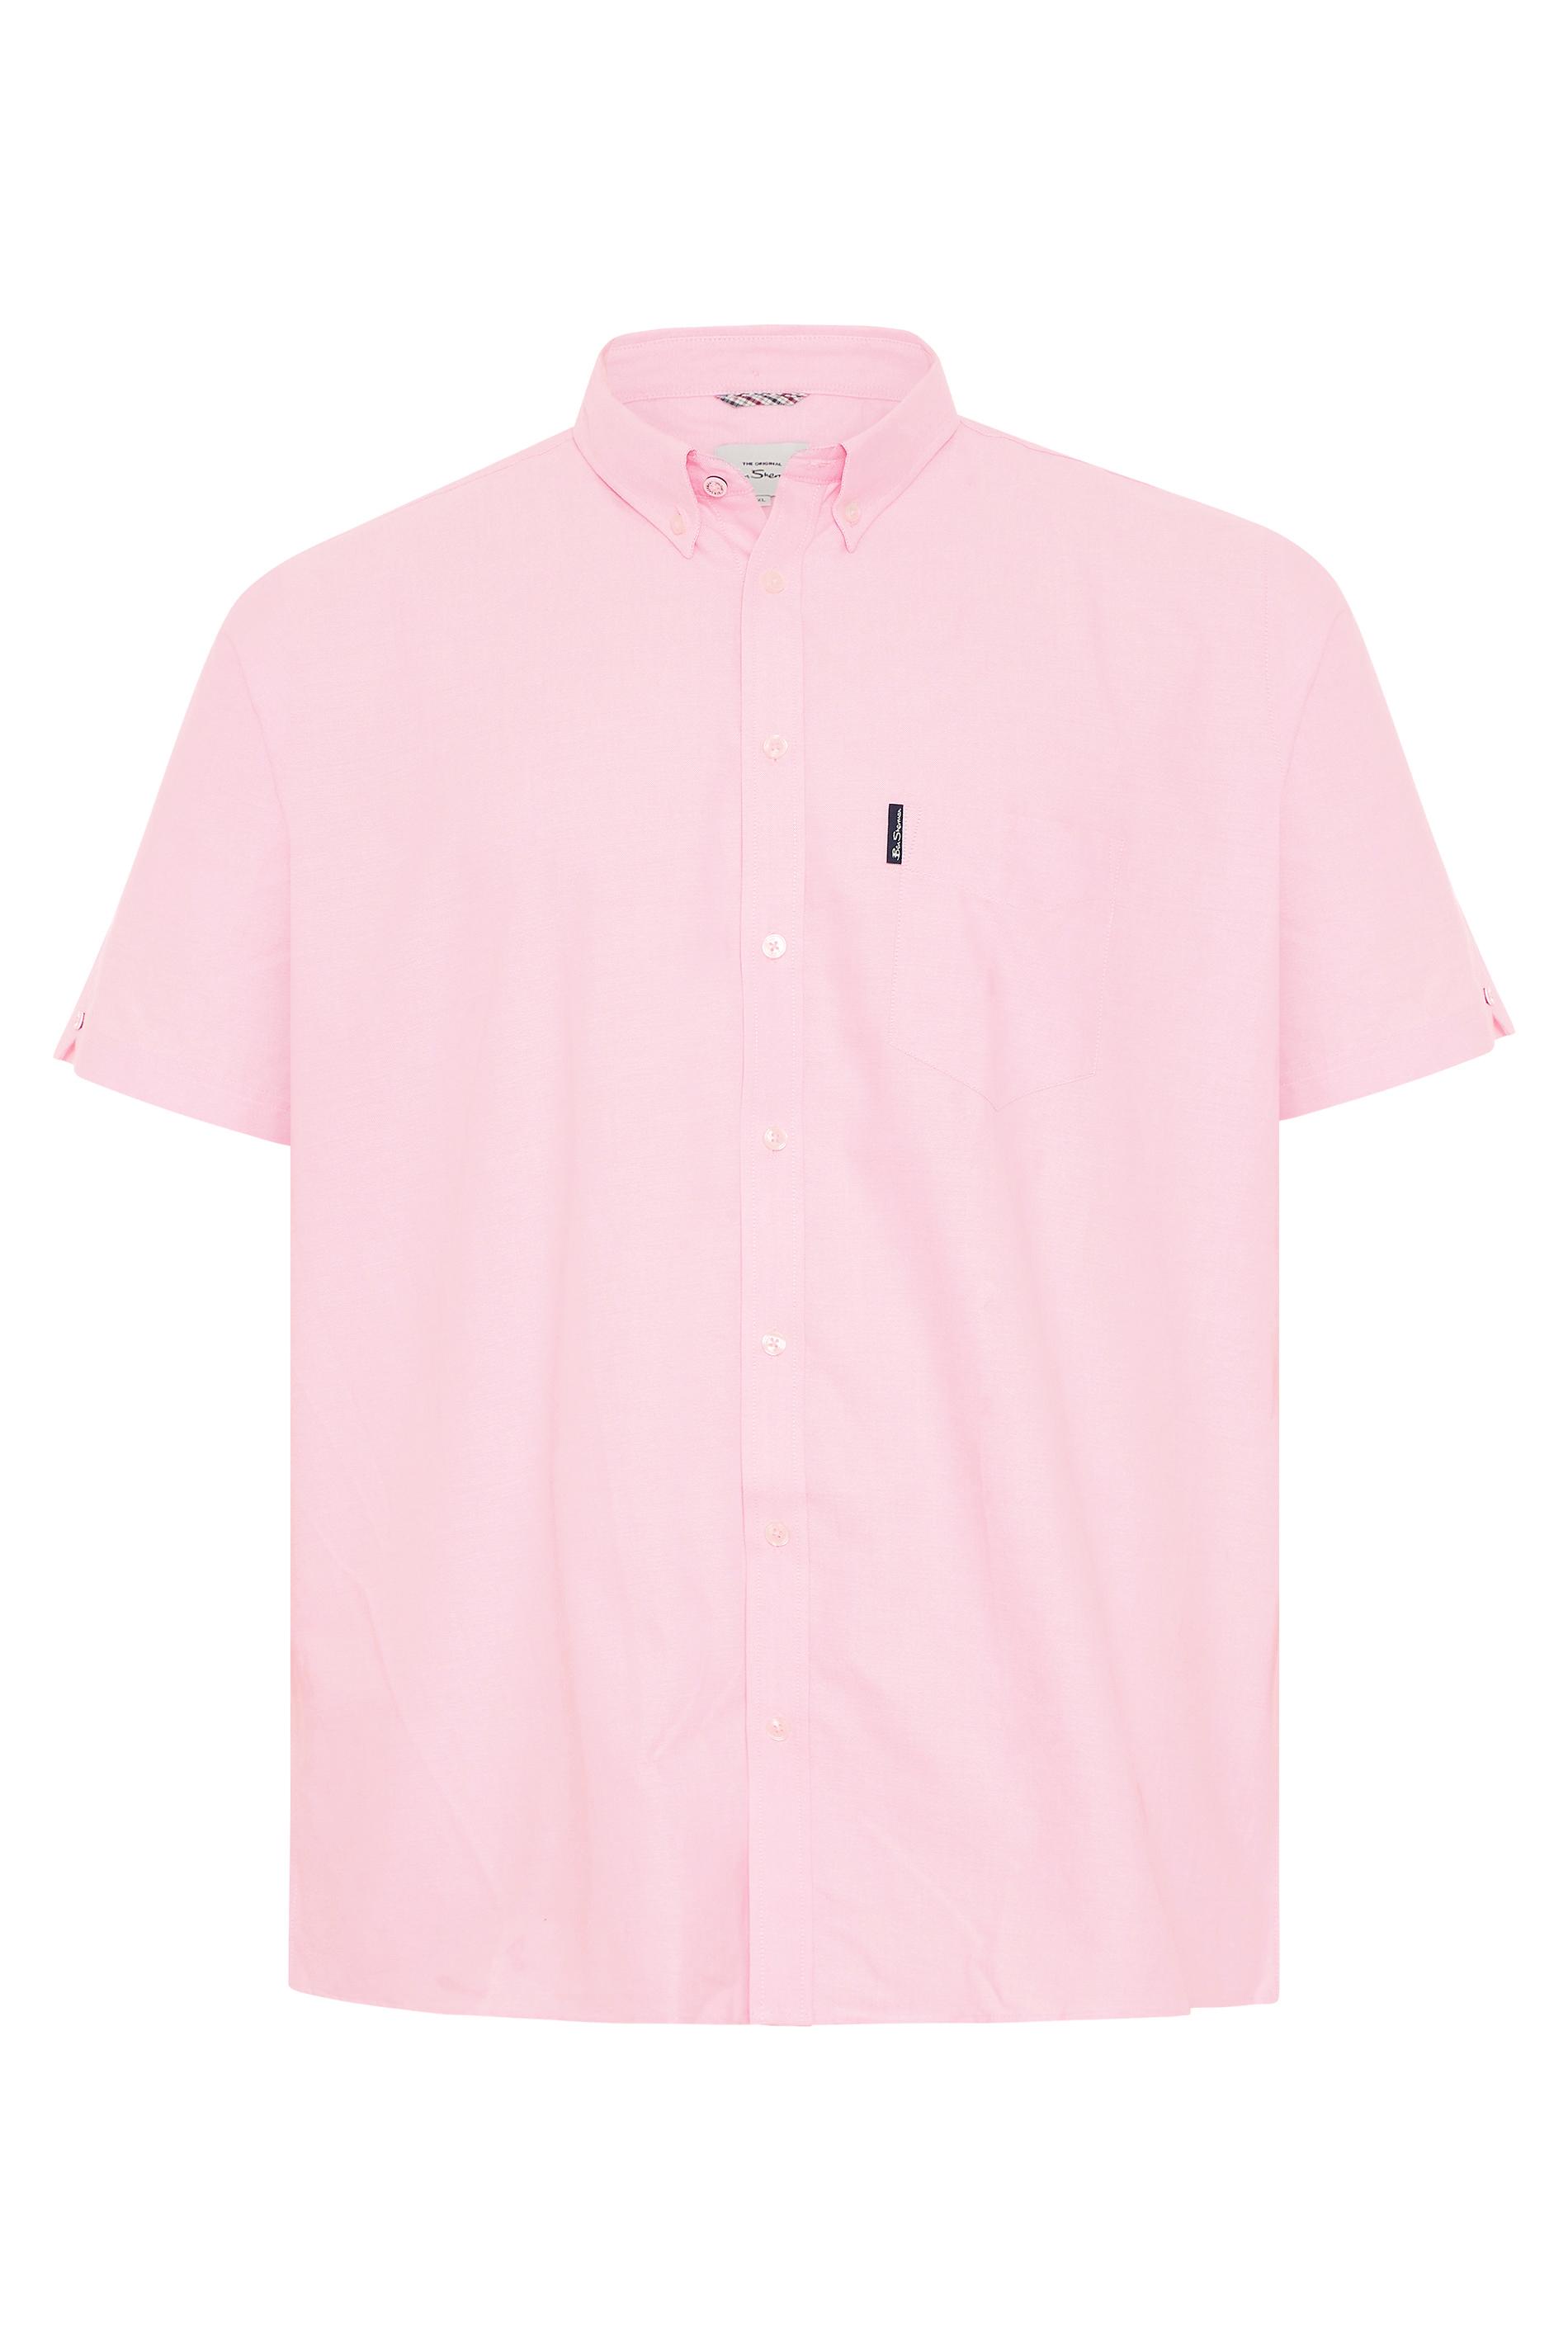 BEN SHERMAN Pink Short Sleeved Oxford Shirt